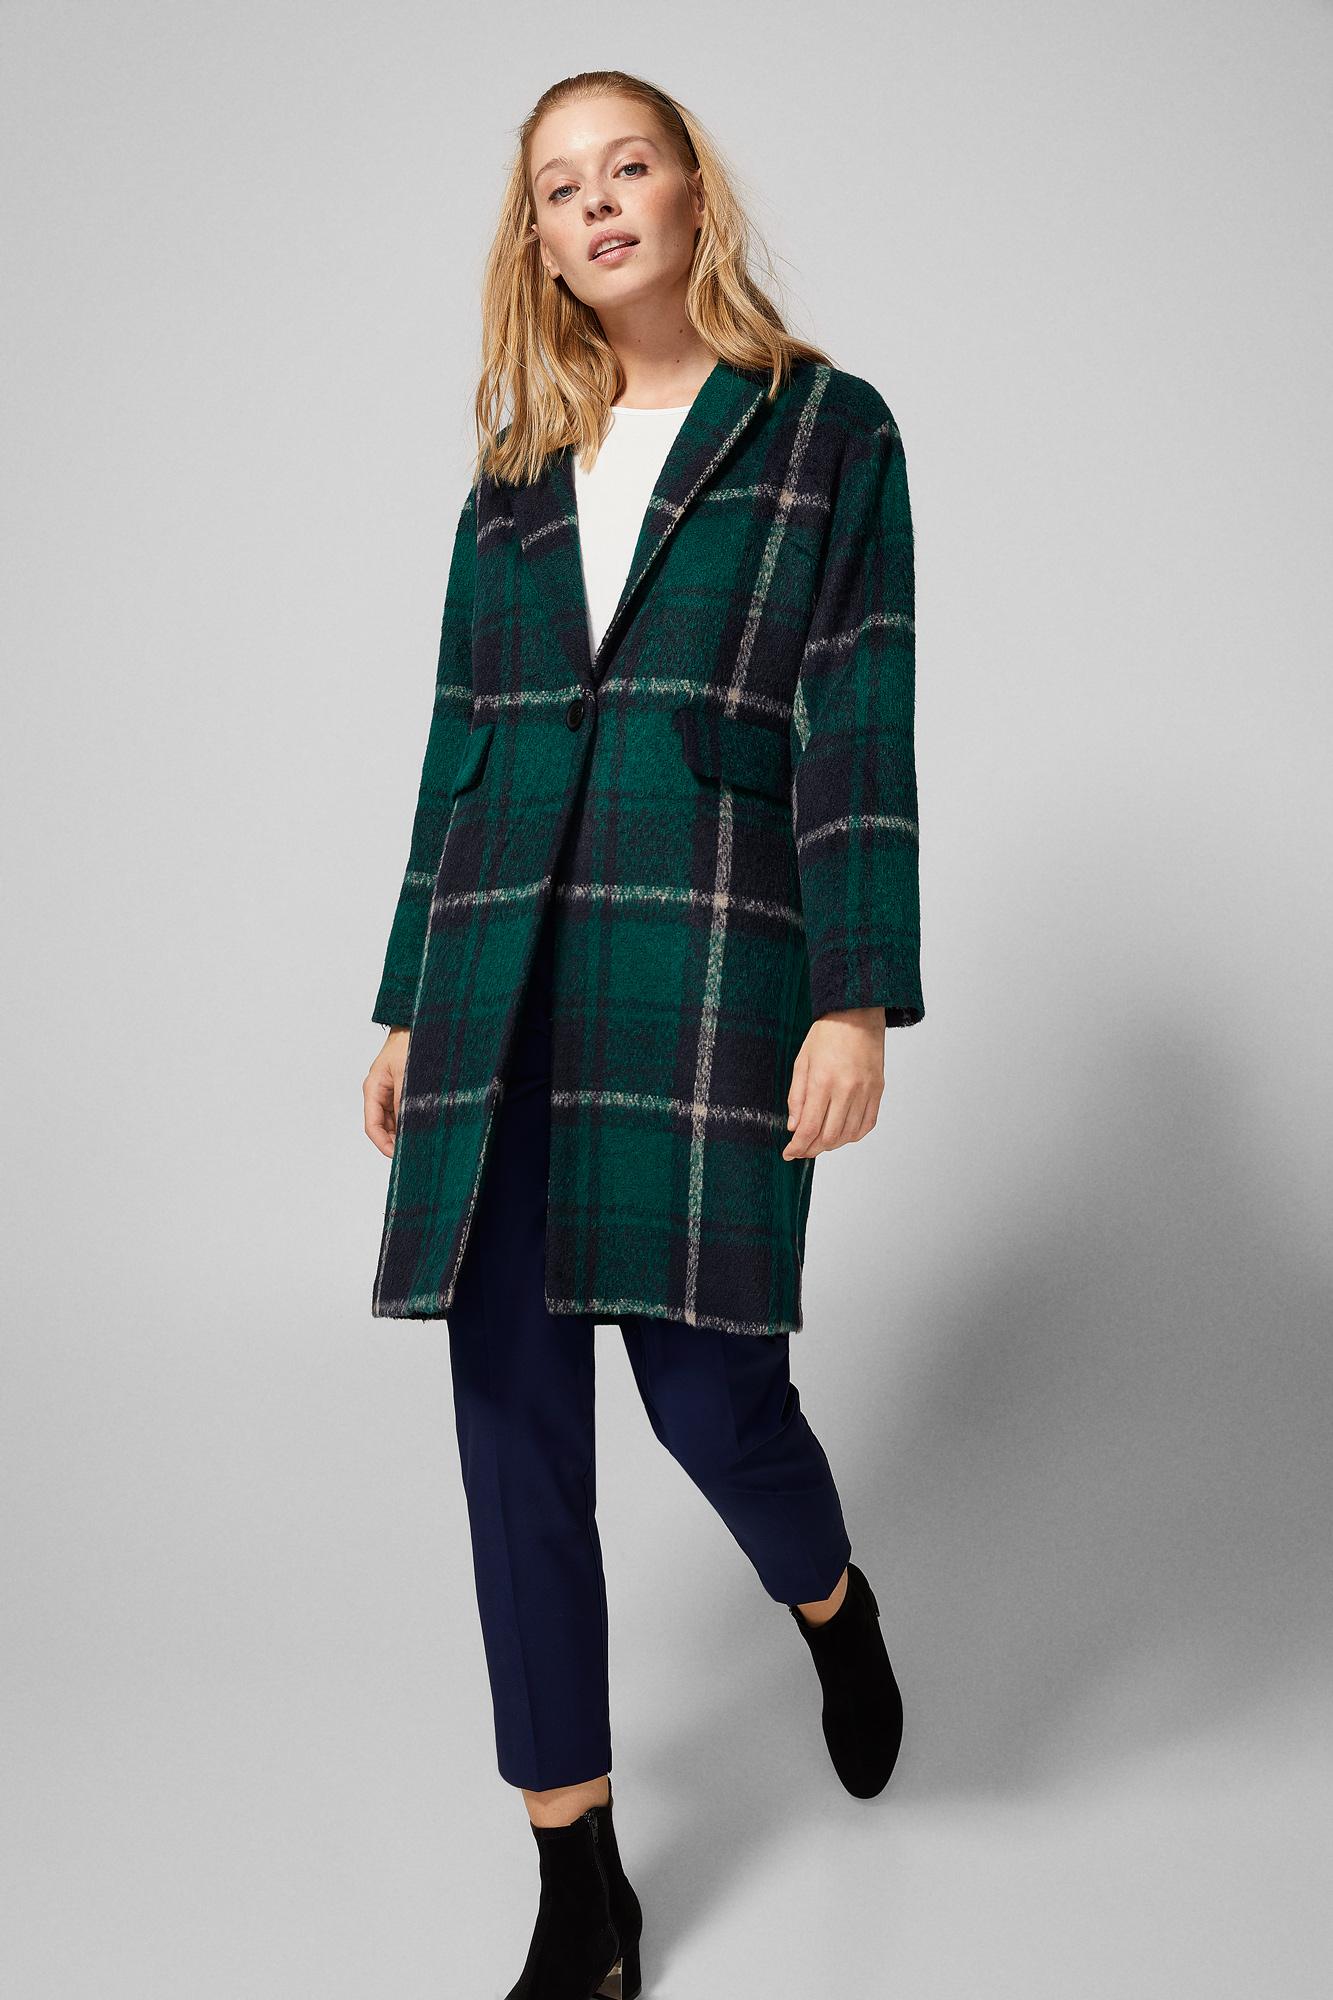 093b927b94 Green checked coat